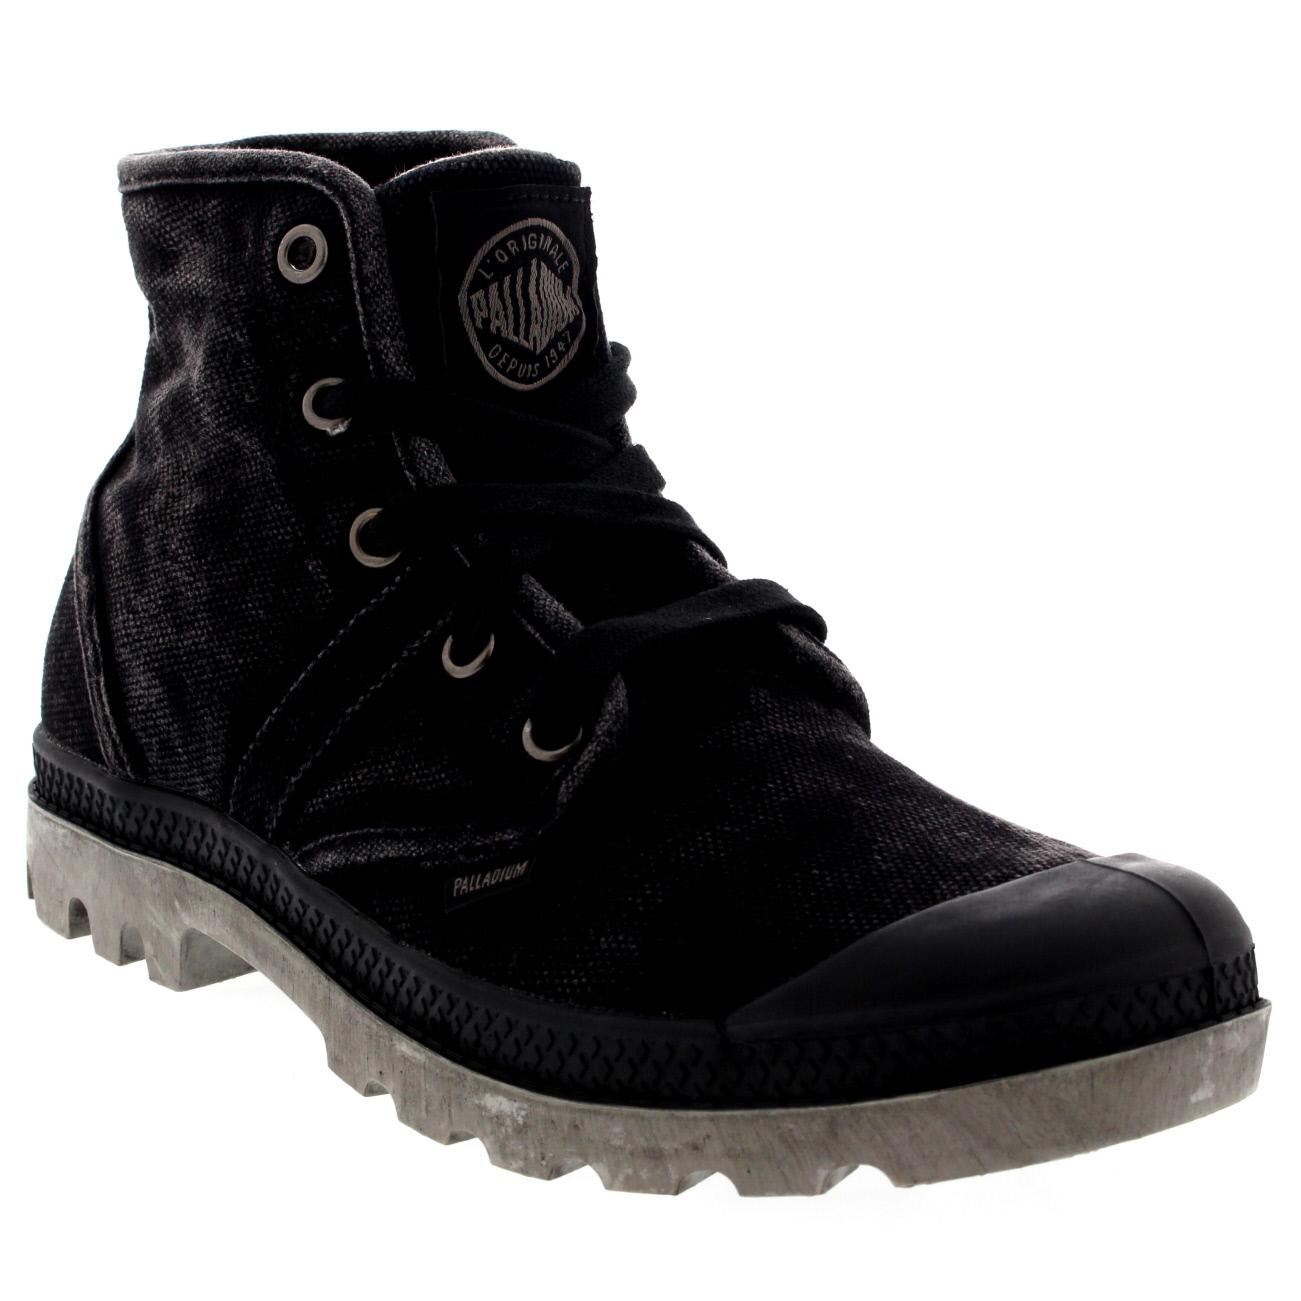 Palladium Pallabrouse Gusset Boots